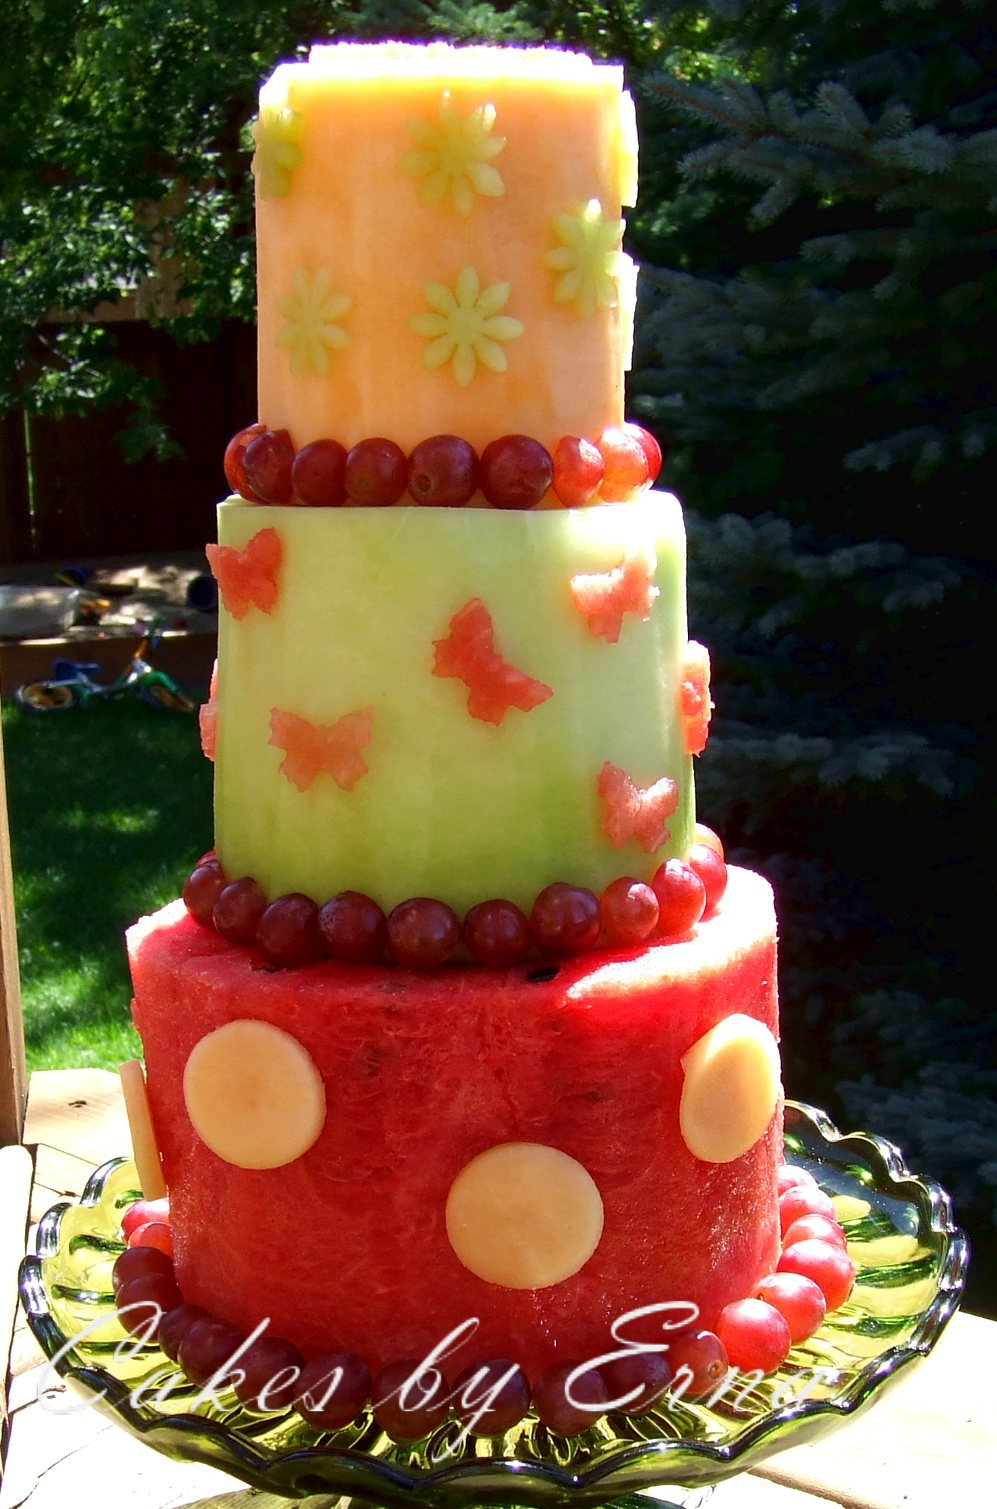 Healthy Ideas Instead Of Birthday Cake